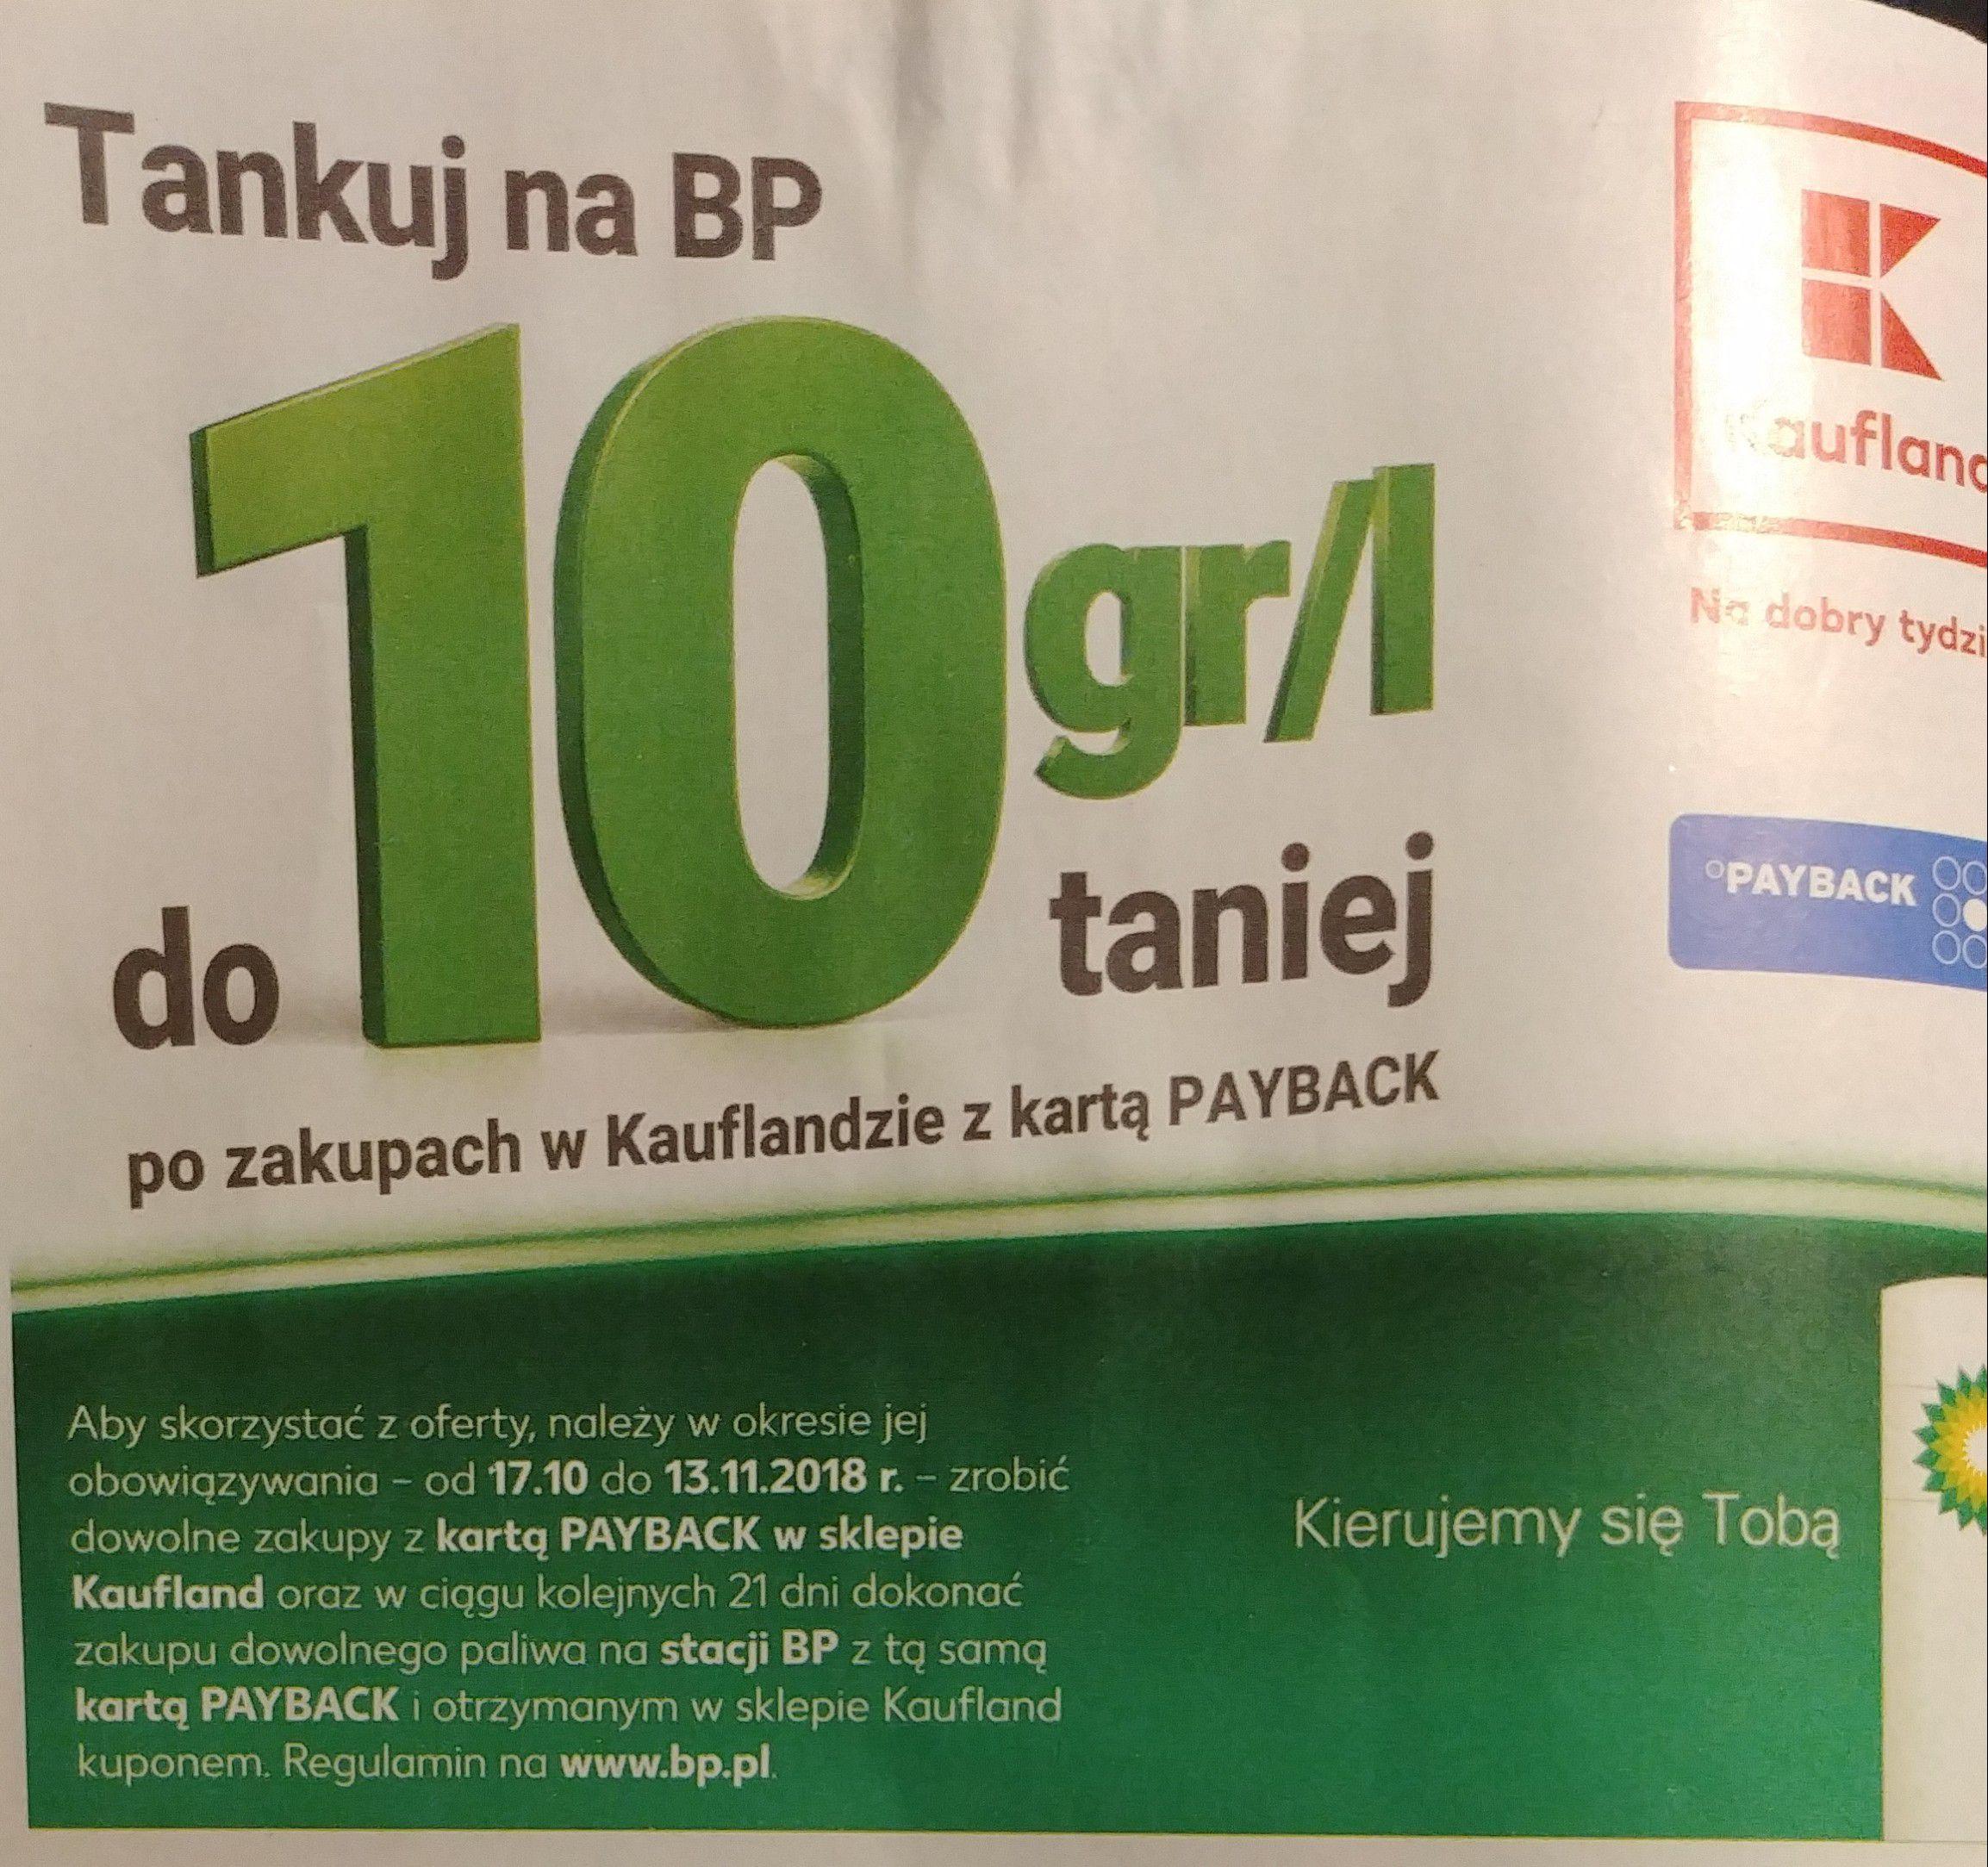 Tankuj na BP do 10 gr taniej po zakupach w Kaufland z karta PAYBACK